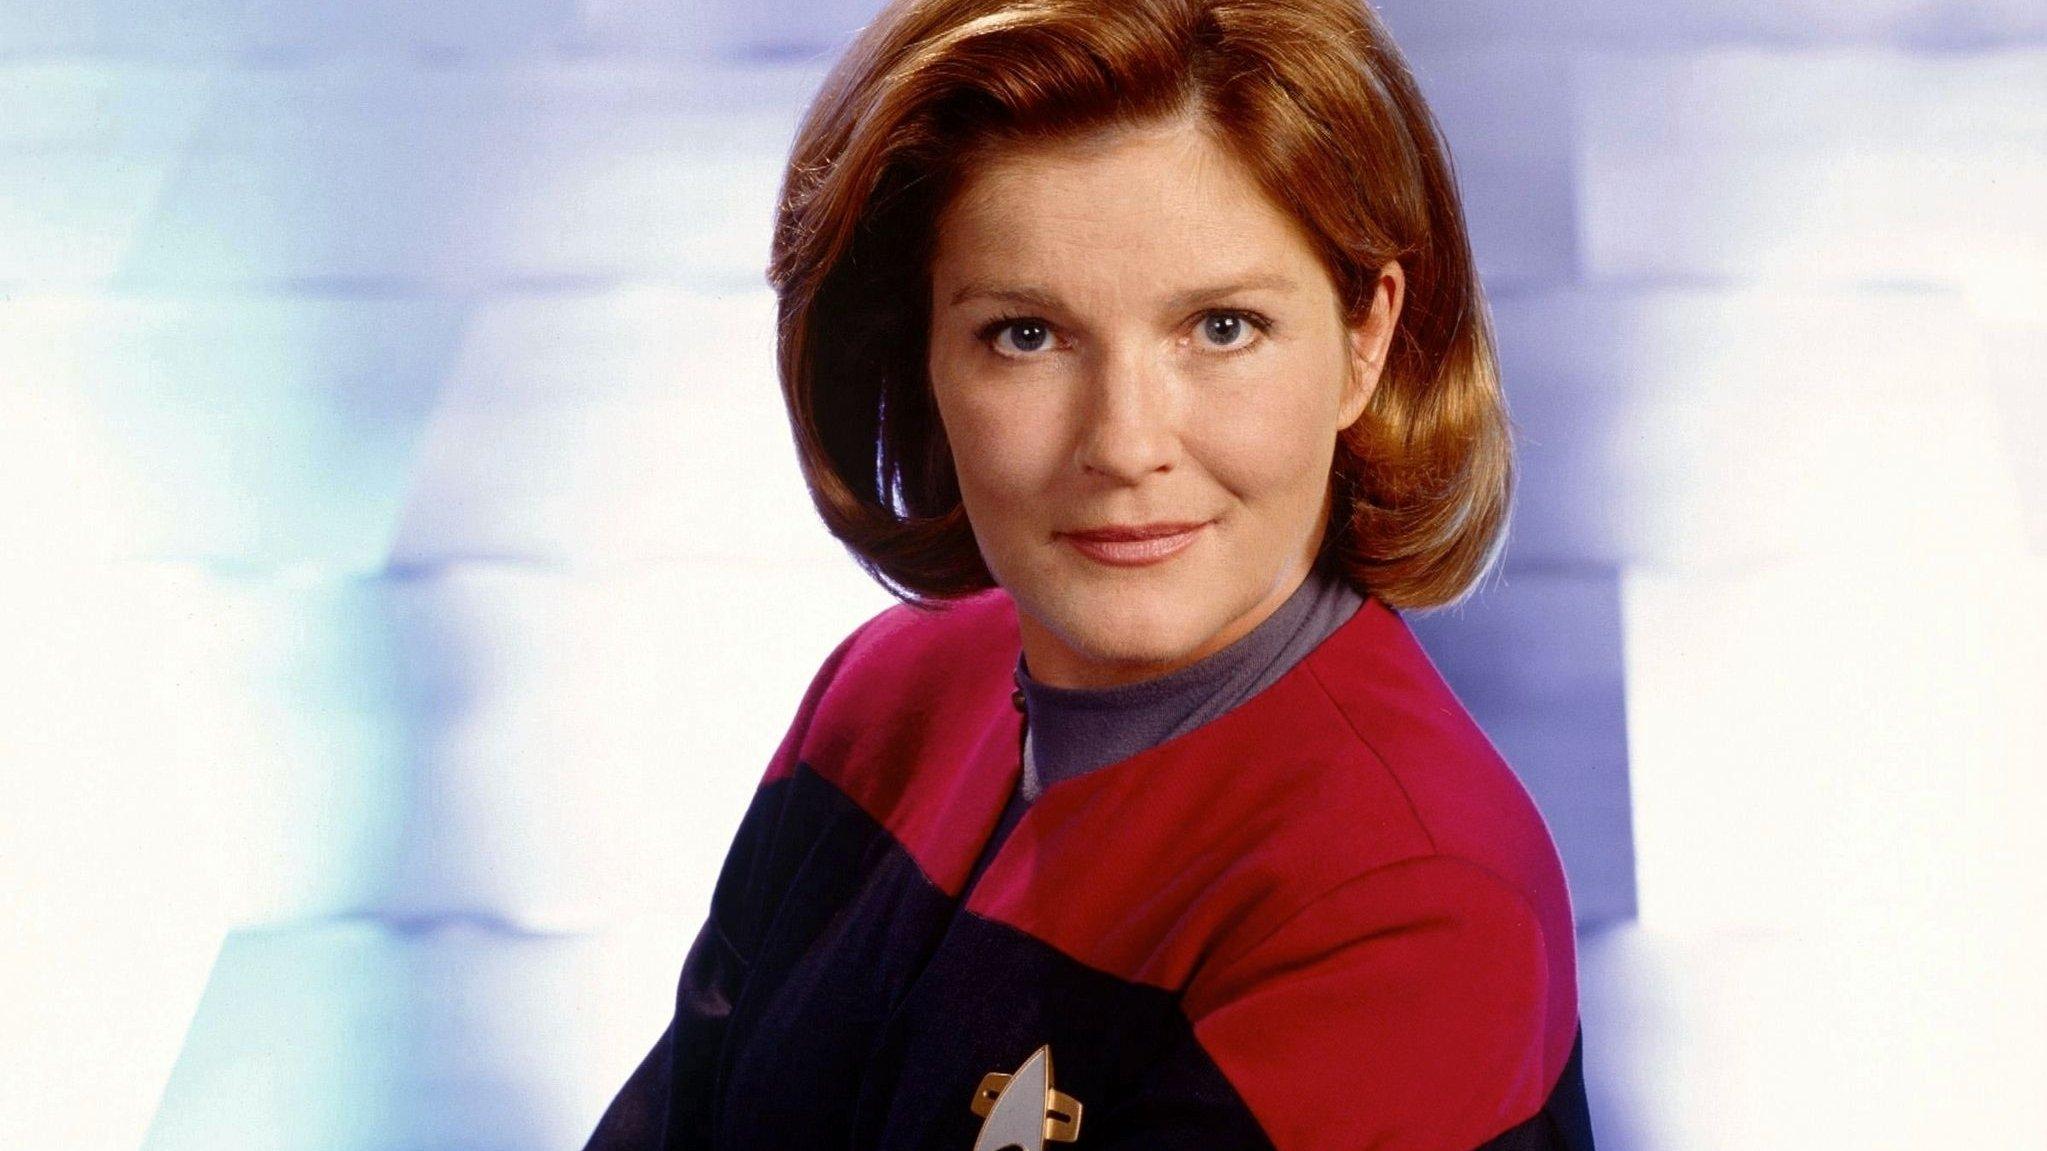 Star Trek: Voyager Spinoff Being Planned & Other Huge Star Trek News